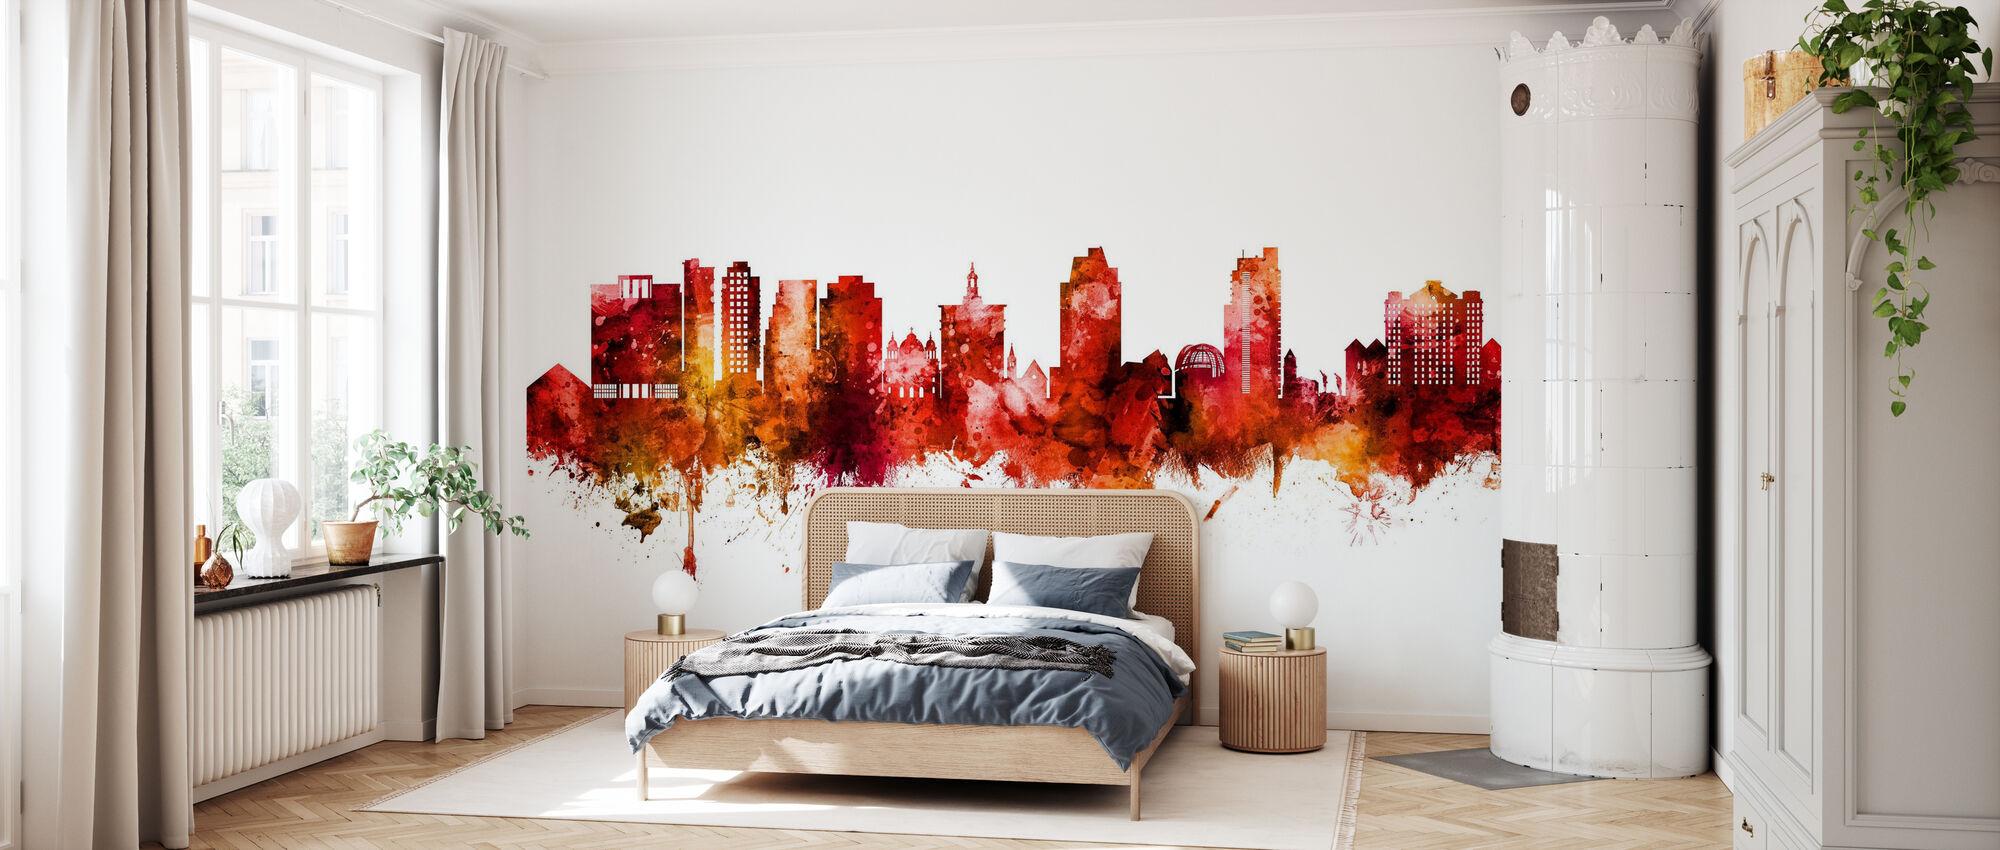 San Jose California Skyline - Wallpaper - Bedroom